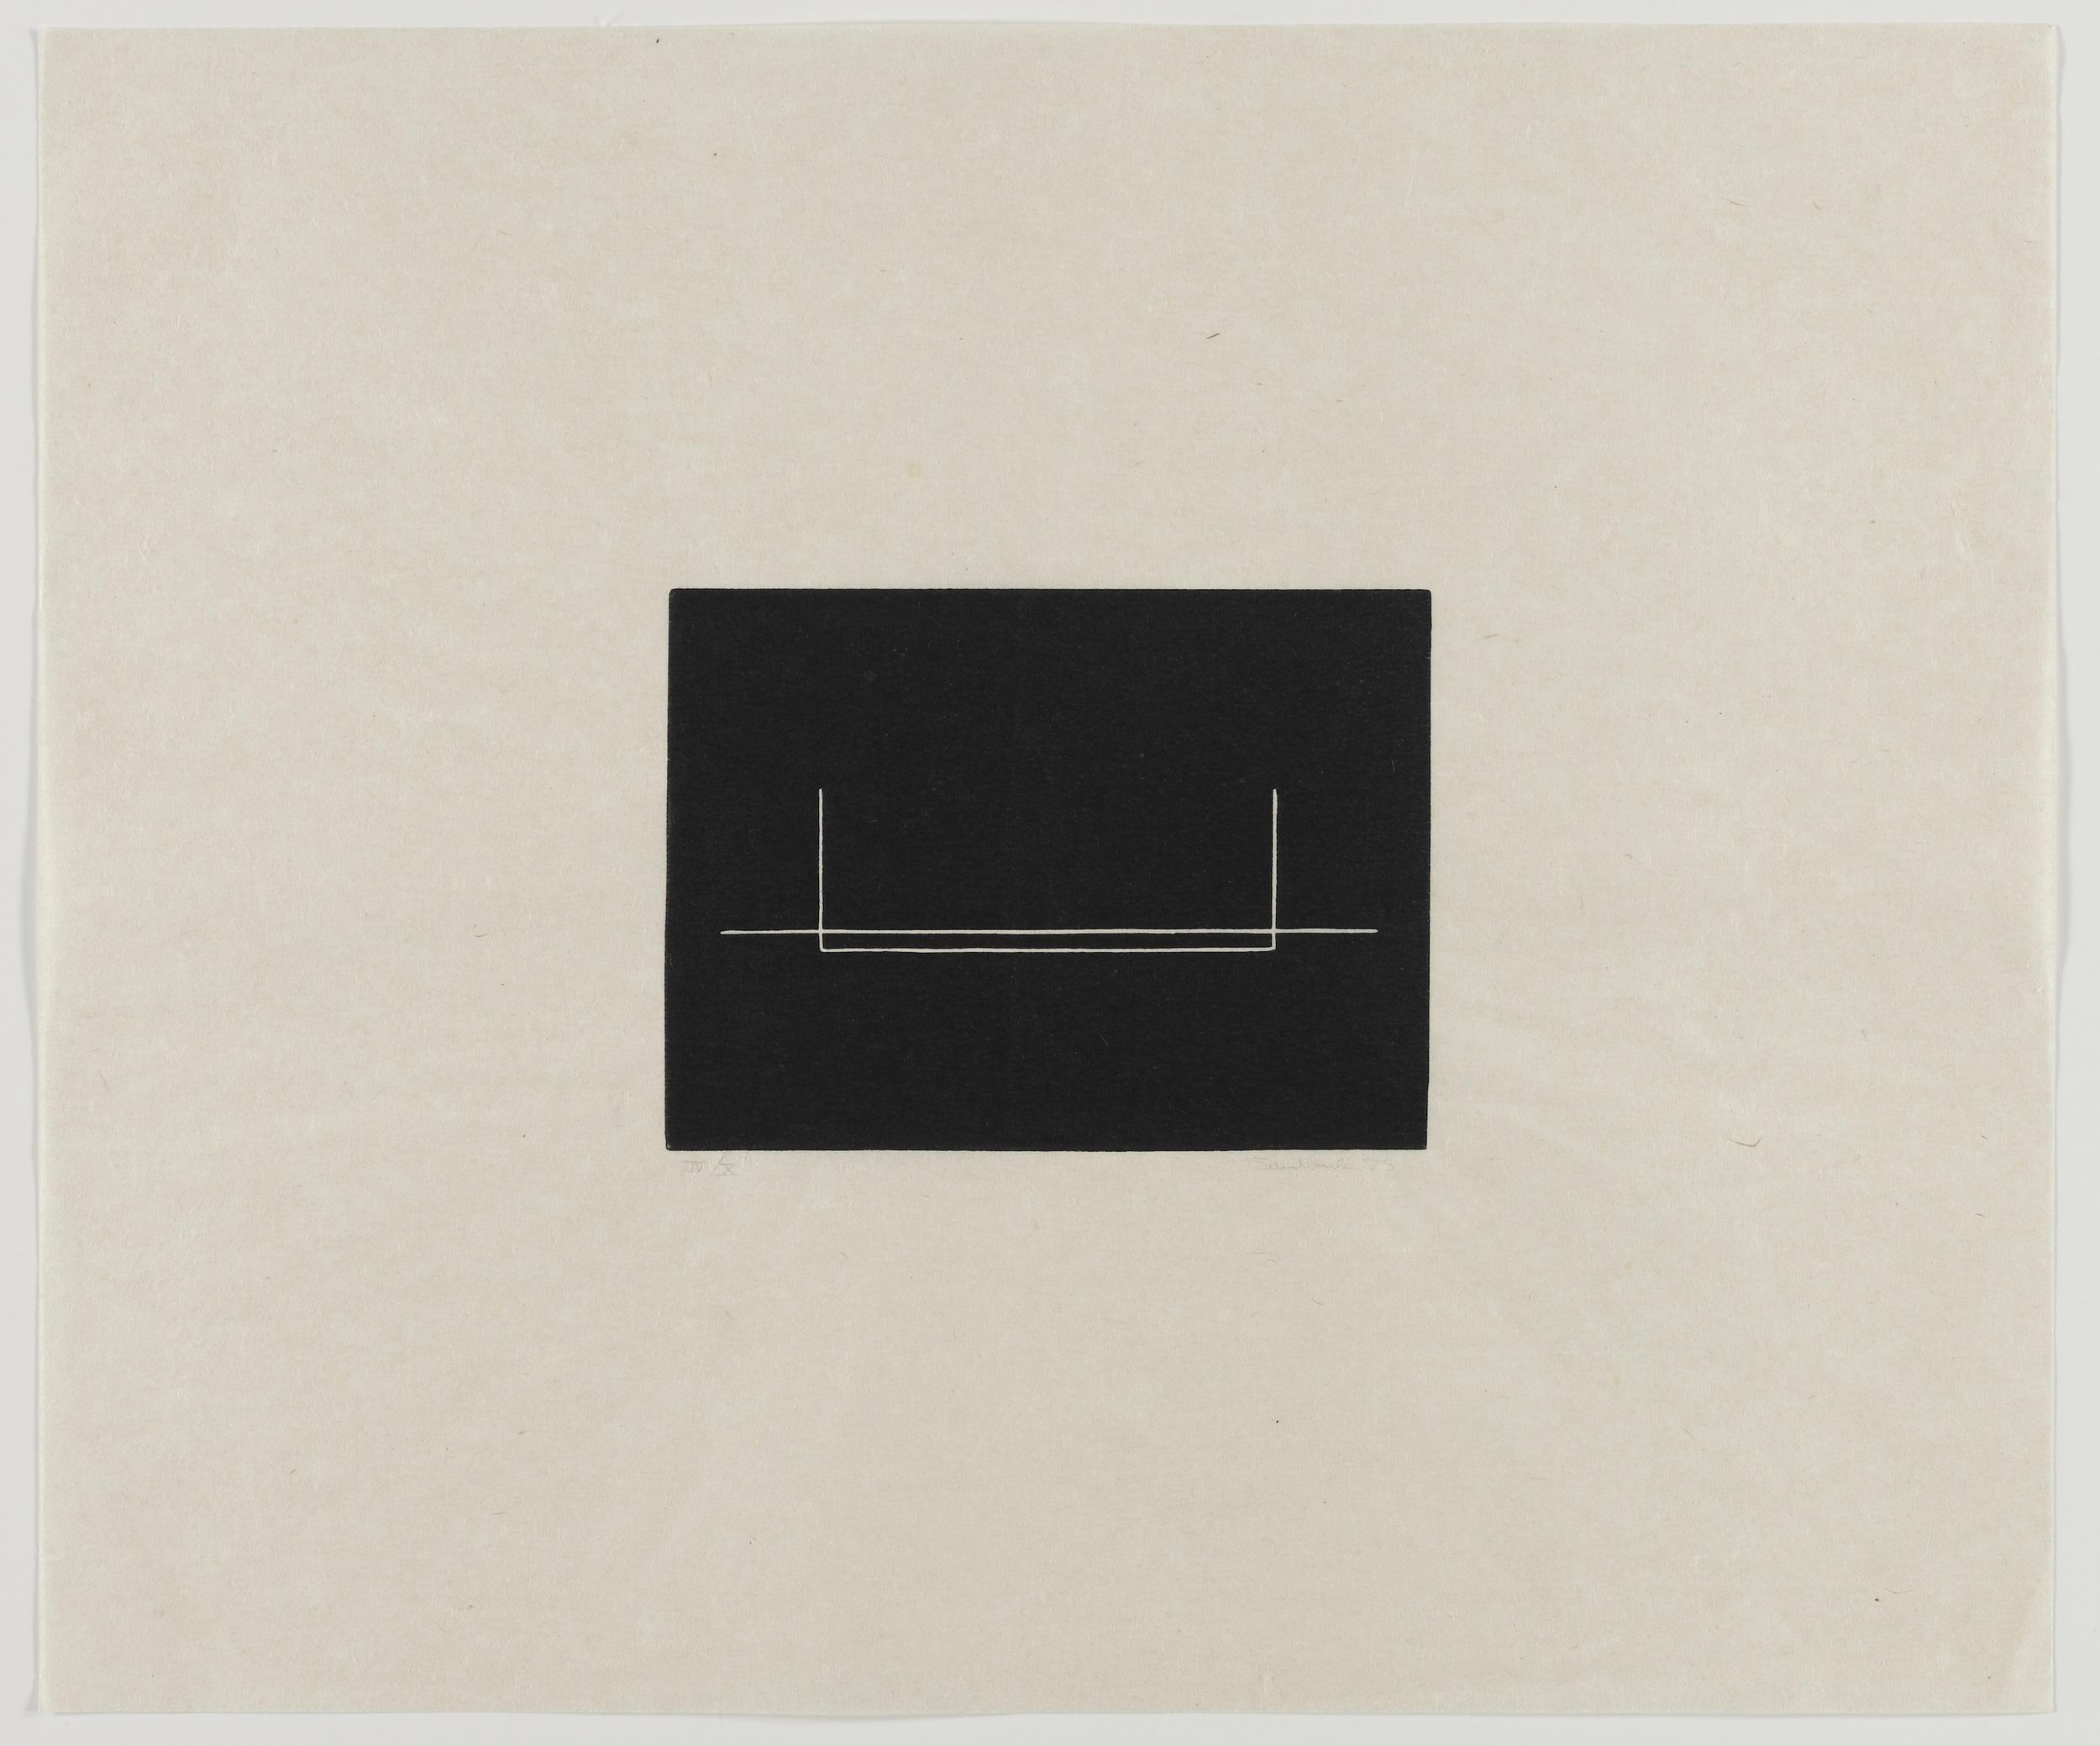 Fred Sandback, Untitled, 1975, Linocut on Japanese paper